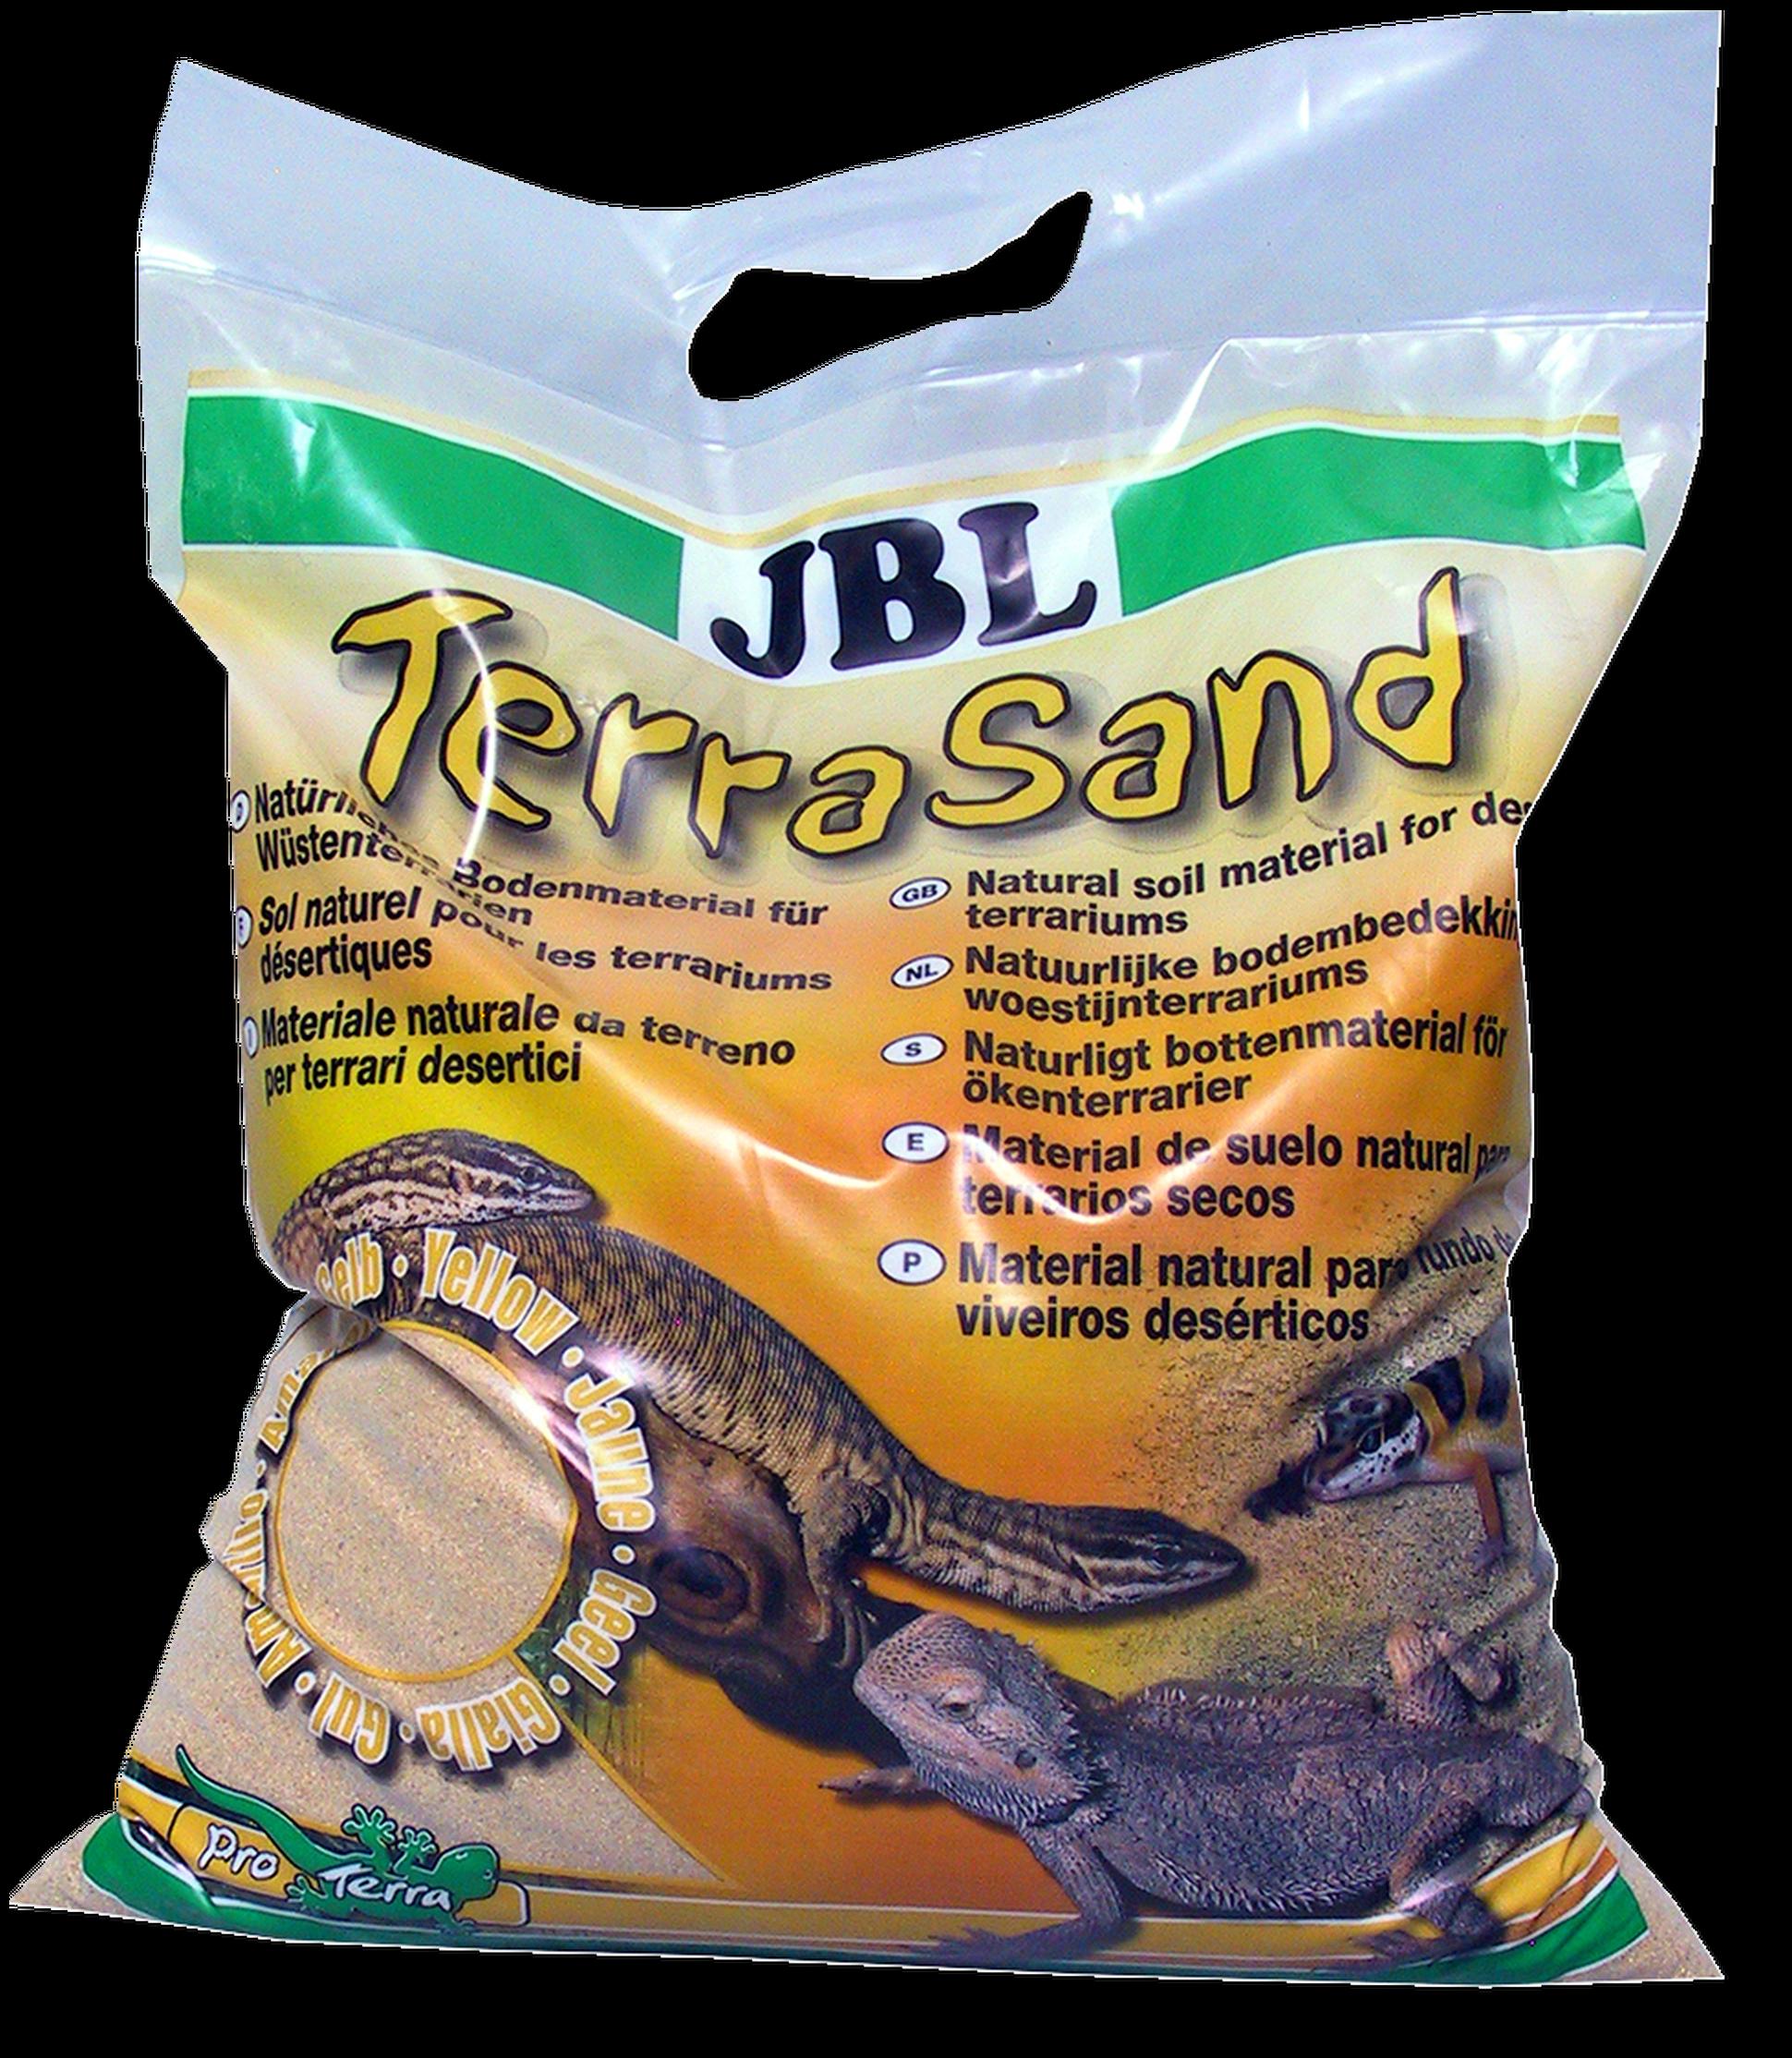 [282.7101800]  JBL TerraSand natural yellow - Донный грунт для пустынных террариумов желтый 7,5 кг